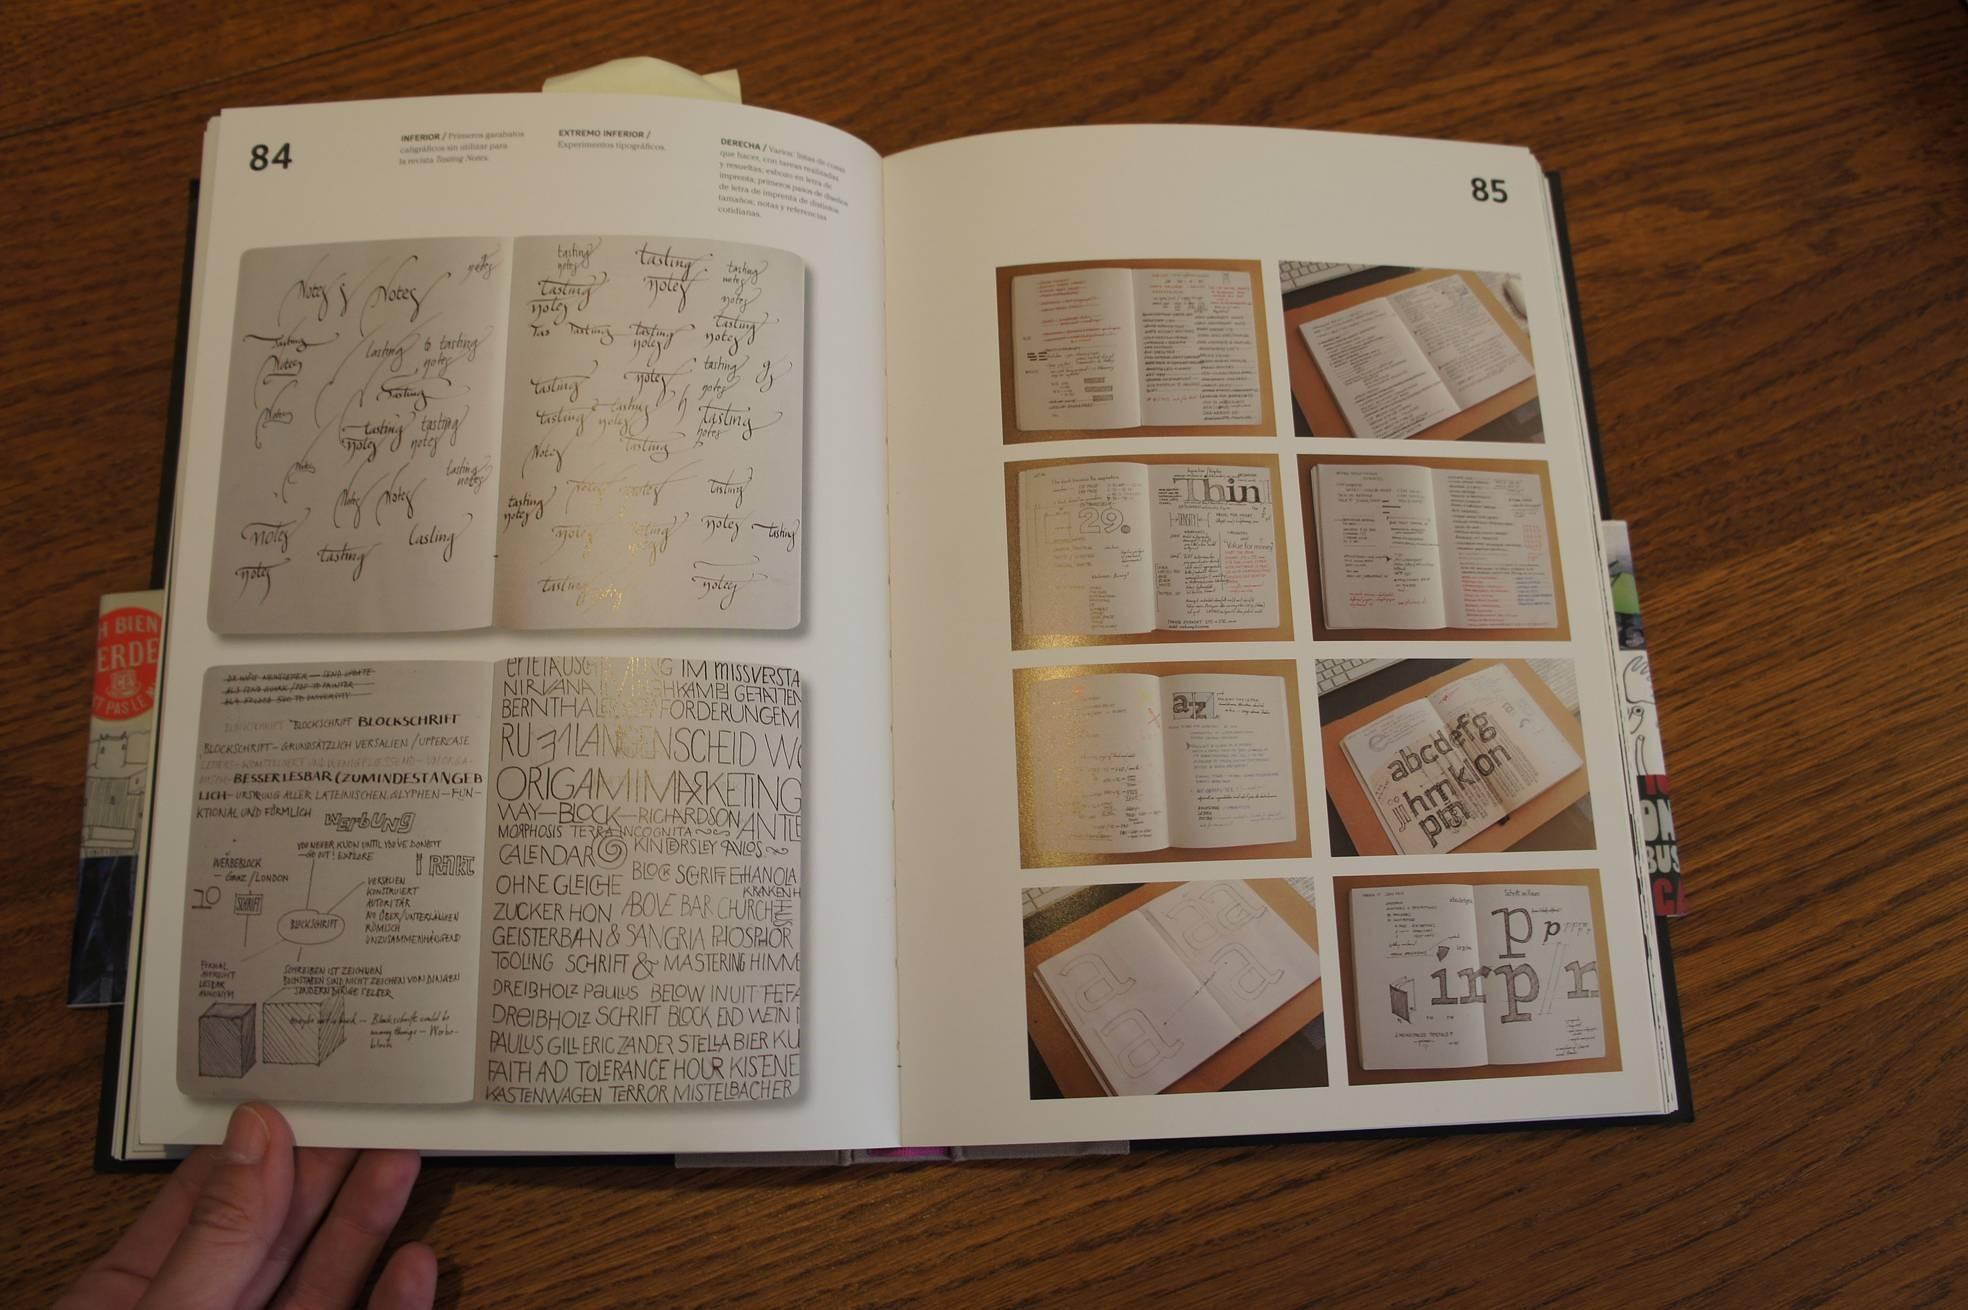 Papercraft Book Das Analoge Nähert Sich Dem Grafischen Design An · Lomography